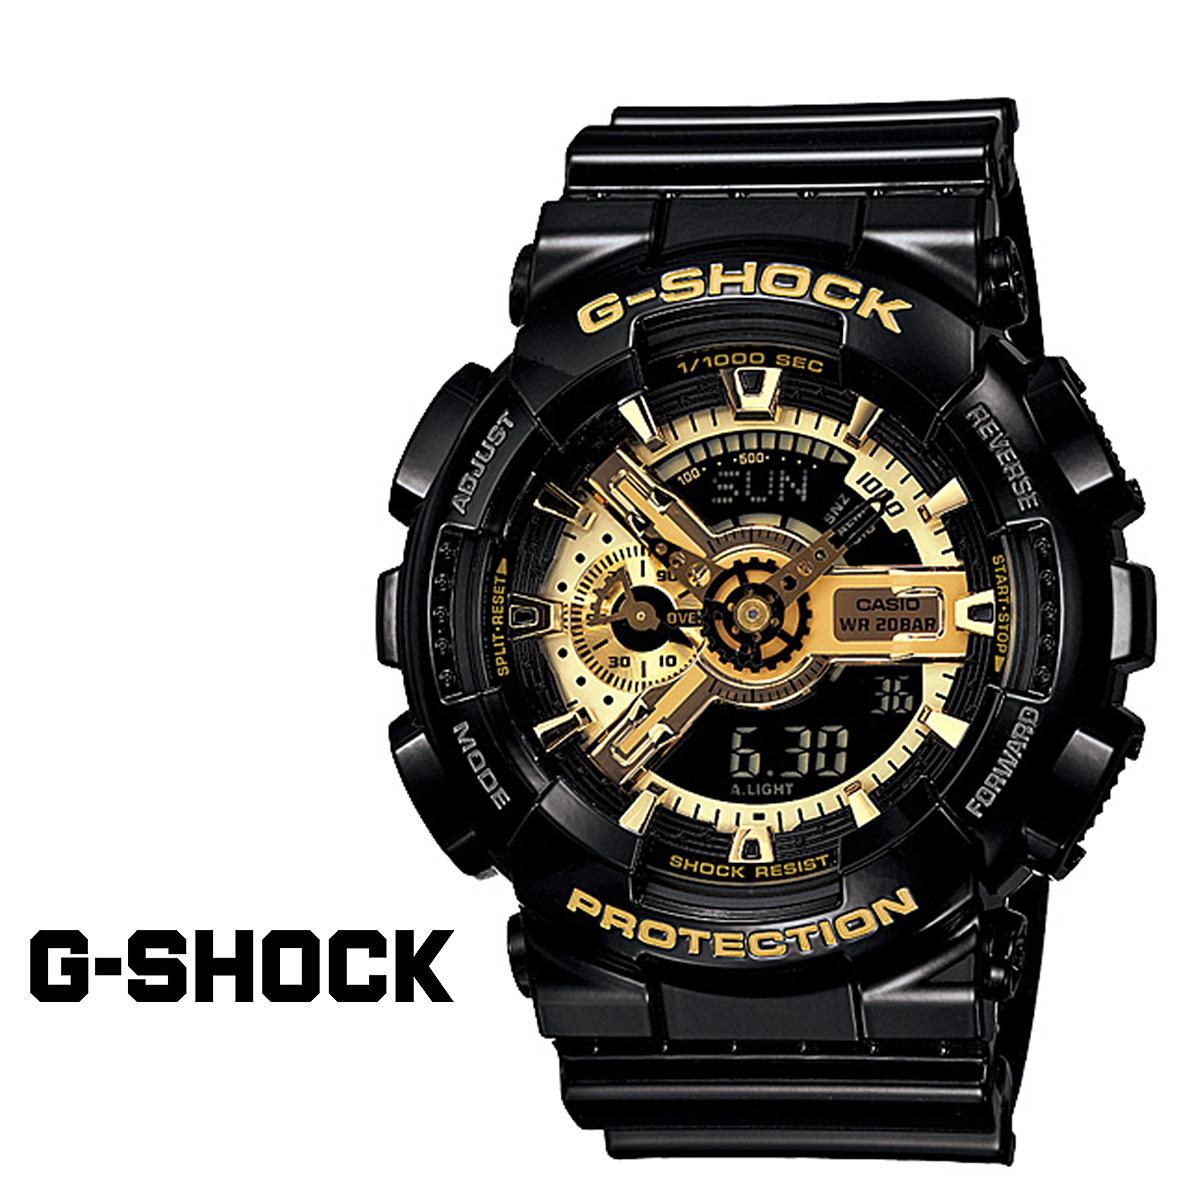 227d4de80 Casio CASIO g-shock GA-110GB-1AJF Watch Black×Gold Series men s women s  watches